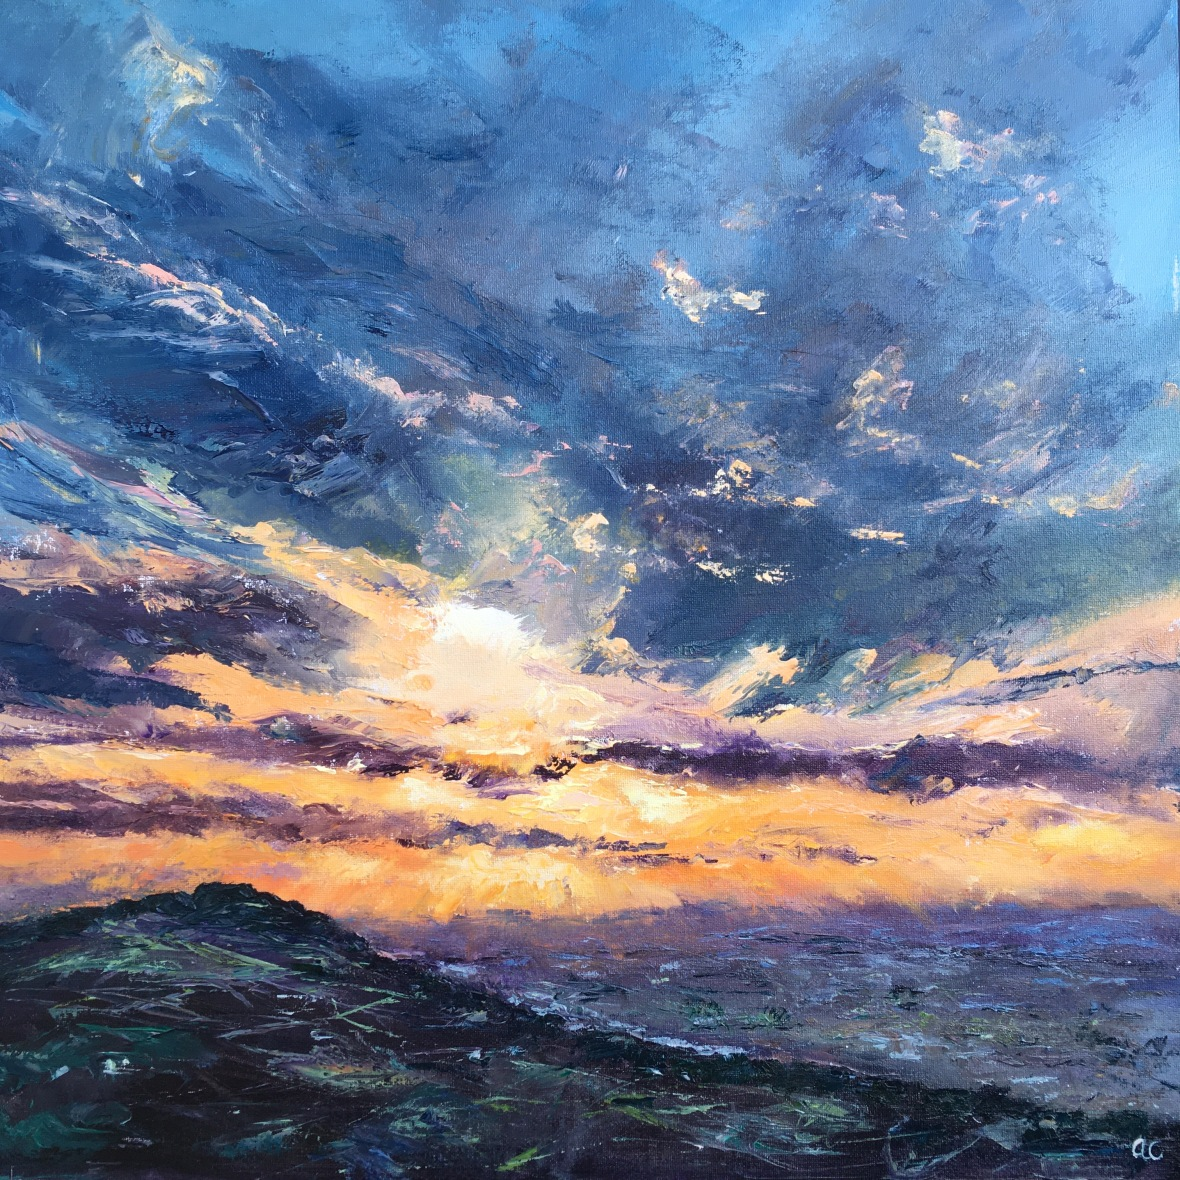 Winter sunset, British Camp Malvern hills oil painting by Anna Cummimg